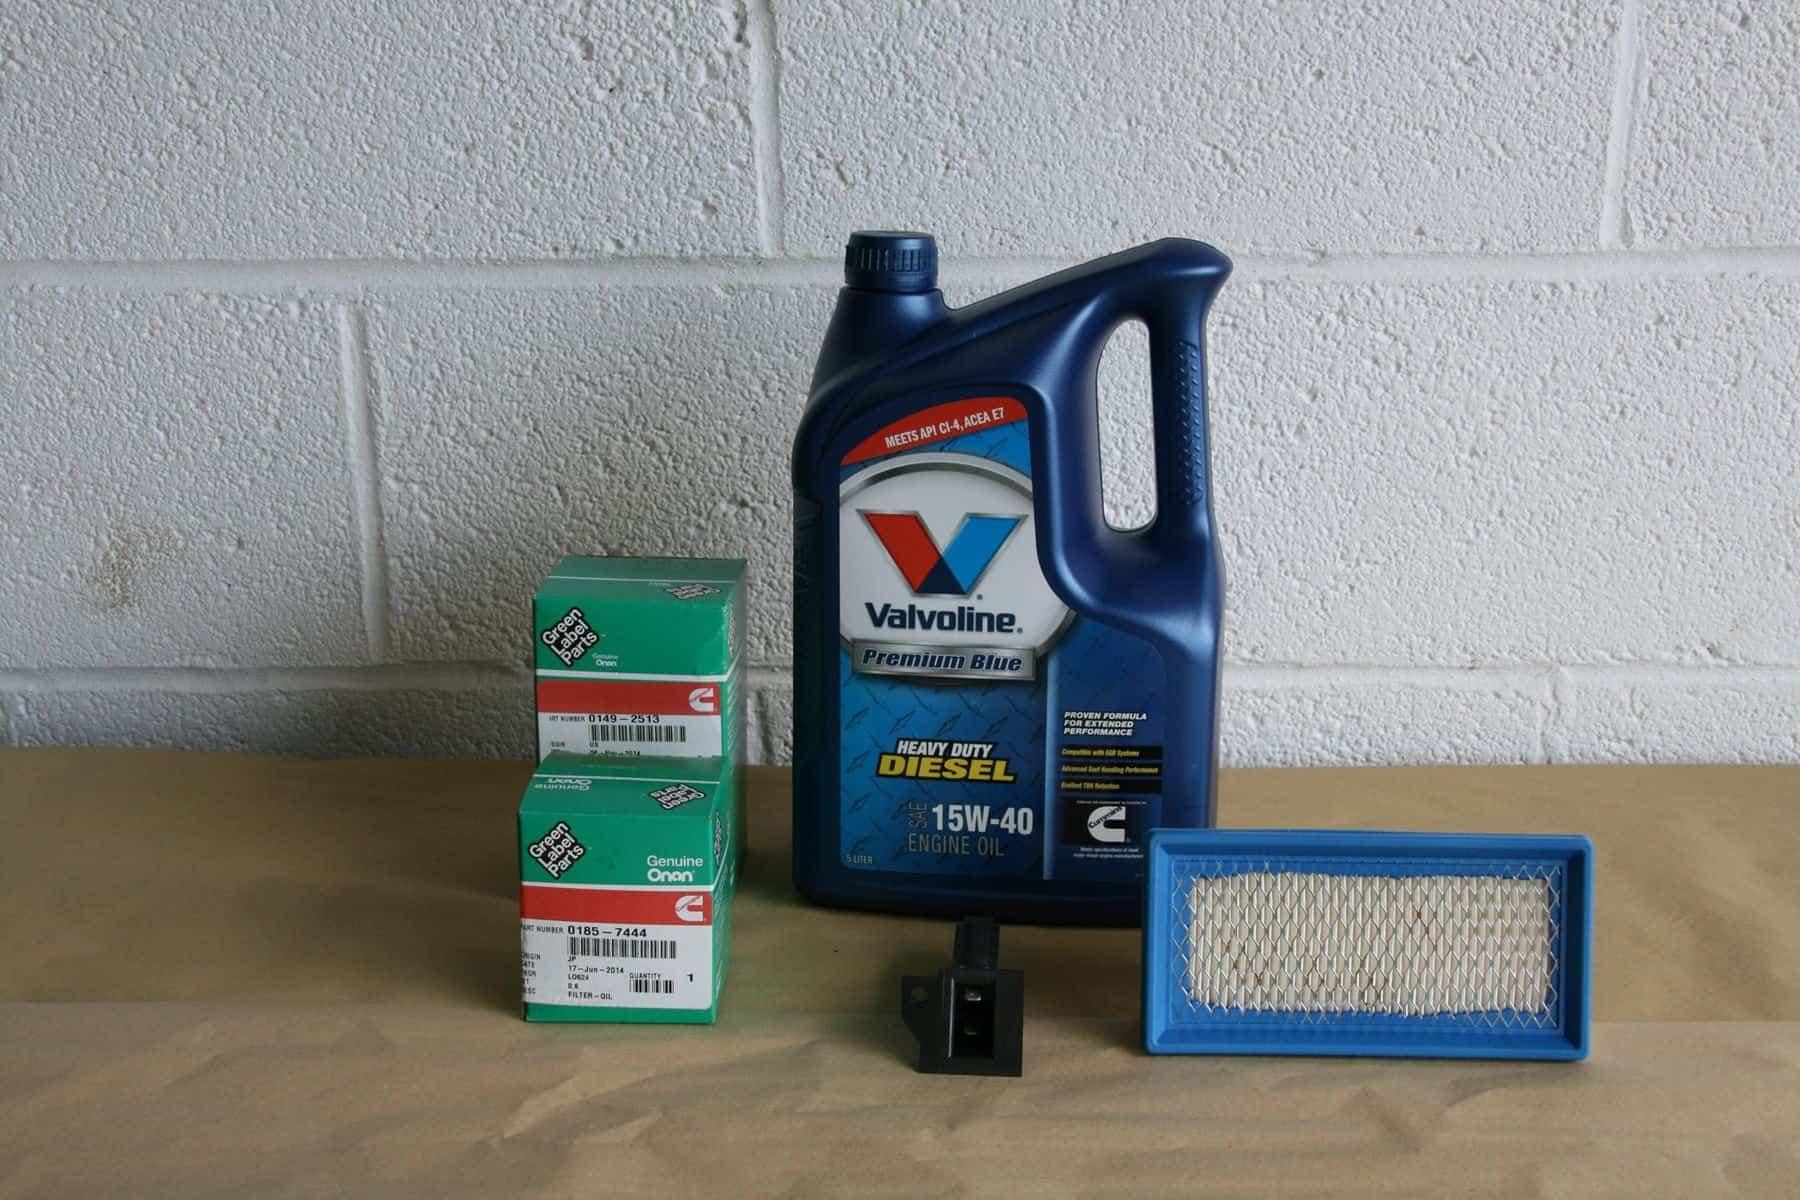 onan 500 hr service kit for hdkbb  u0026 hdkbc generator sets